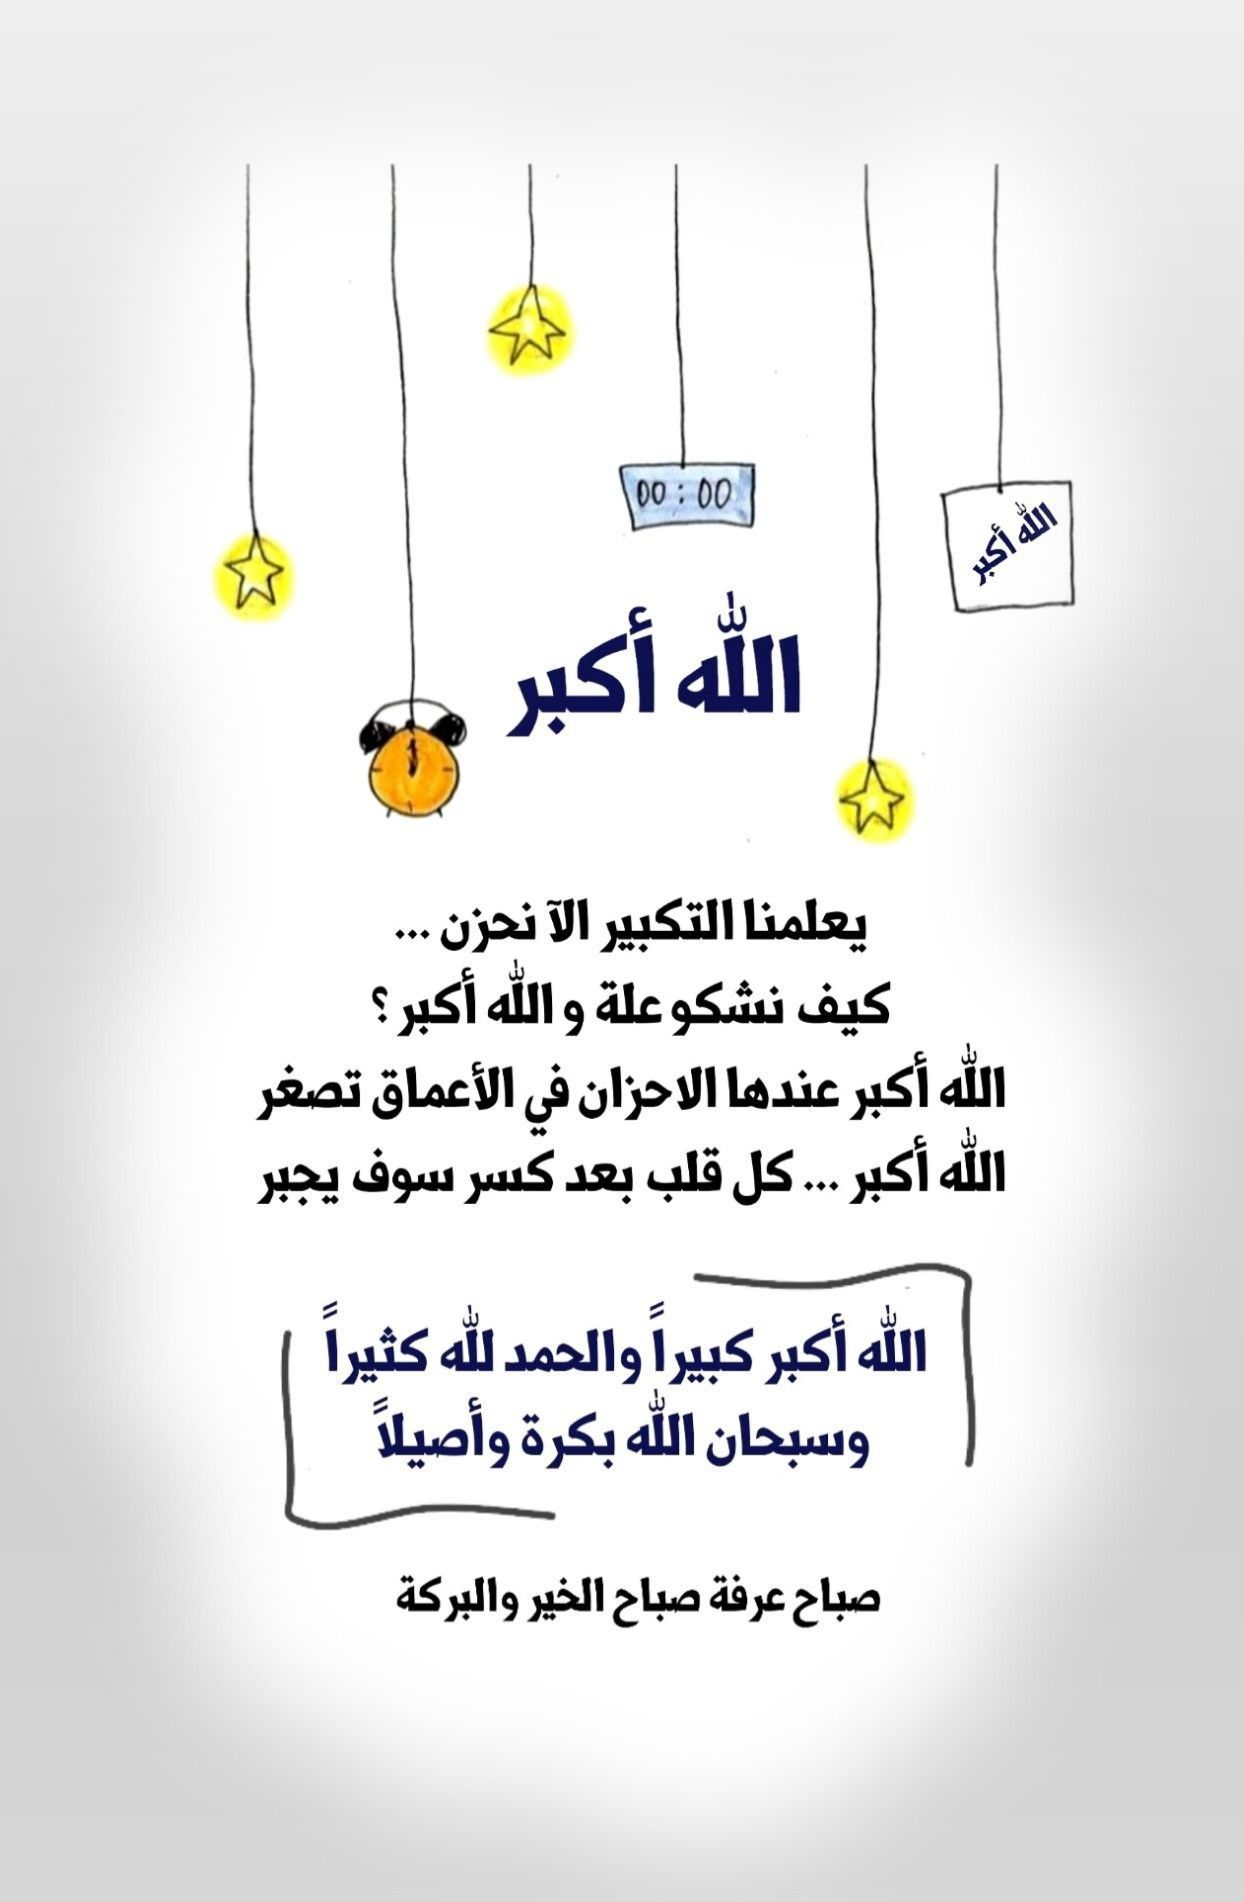 Pin By Adil Al Riyami On يوم عرفة Good Morning Greetings Morning Greeting Morning Wish